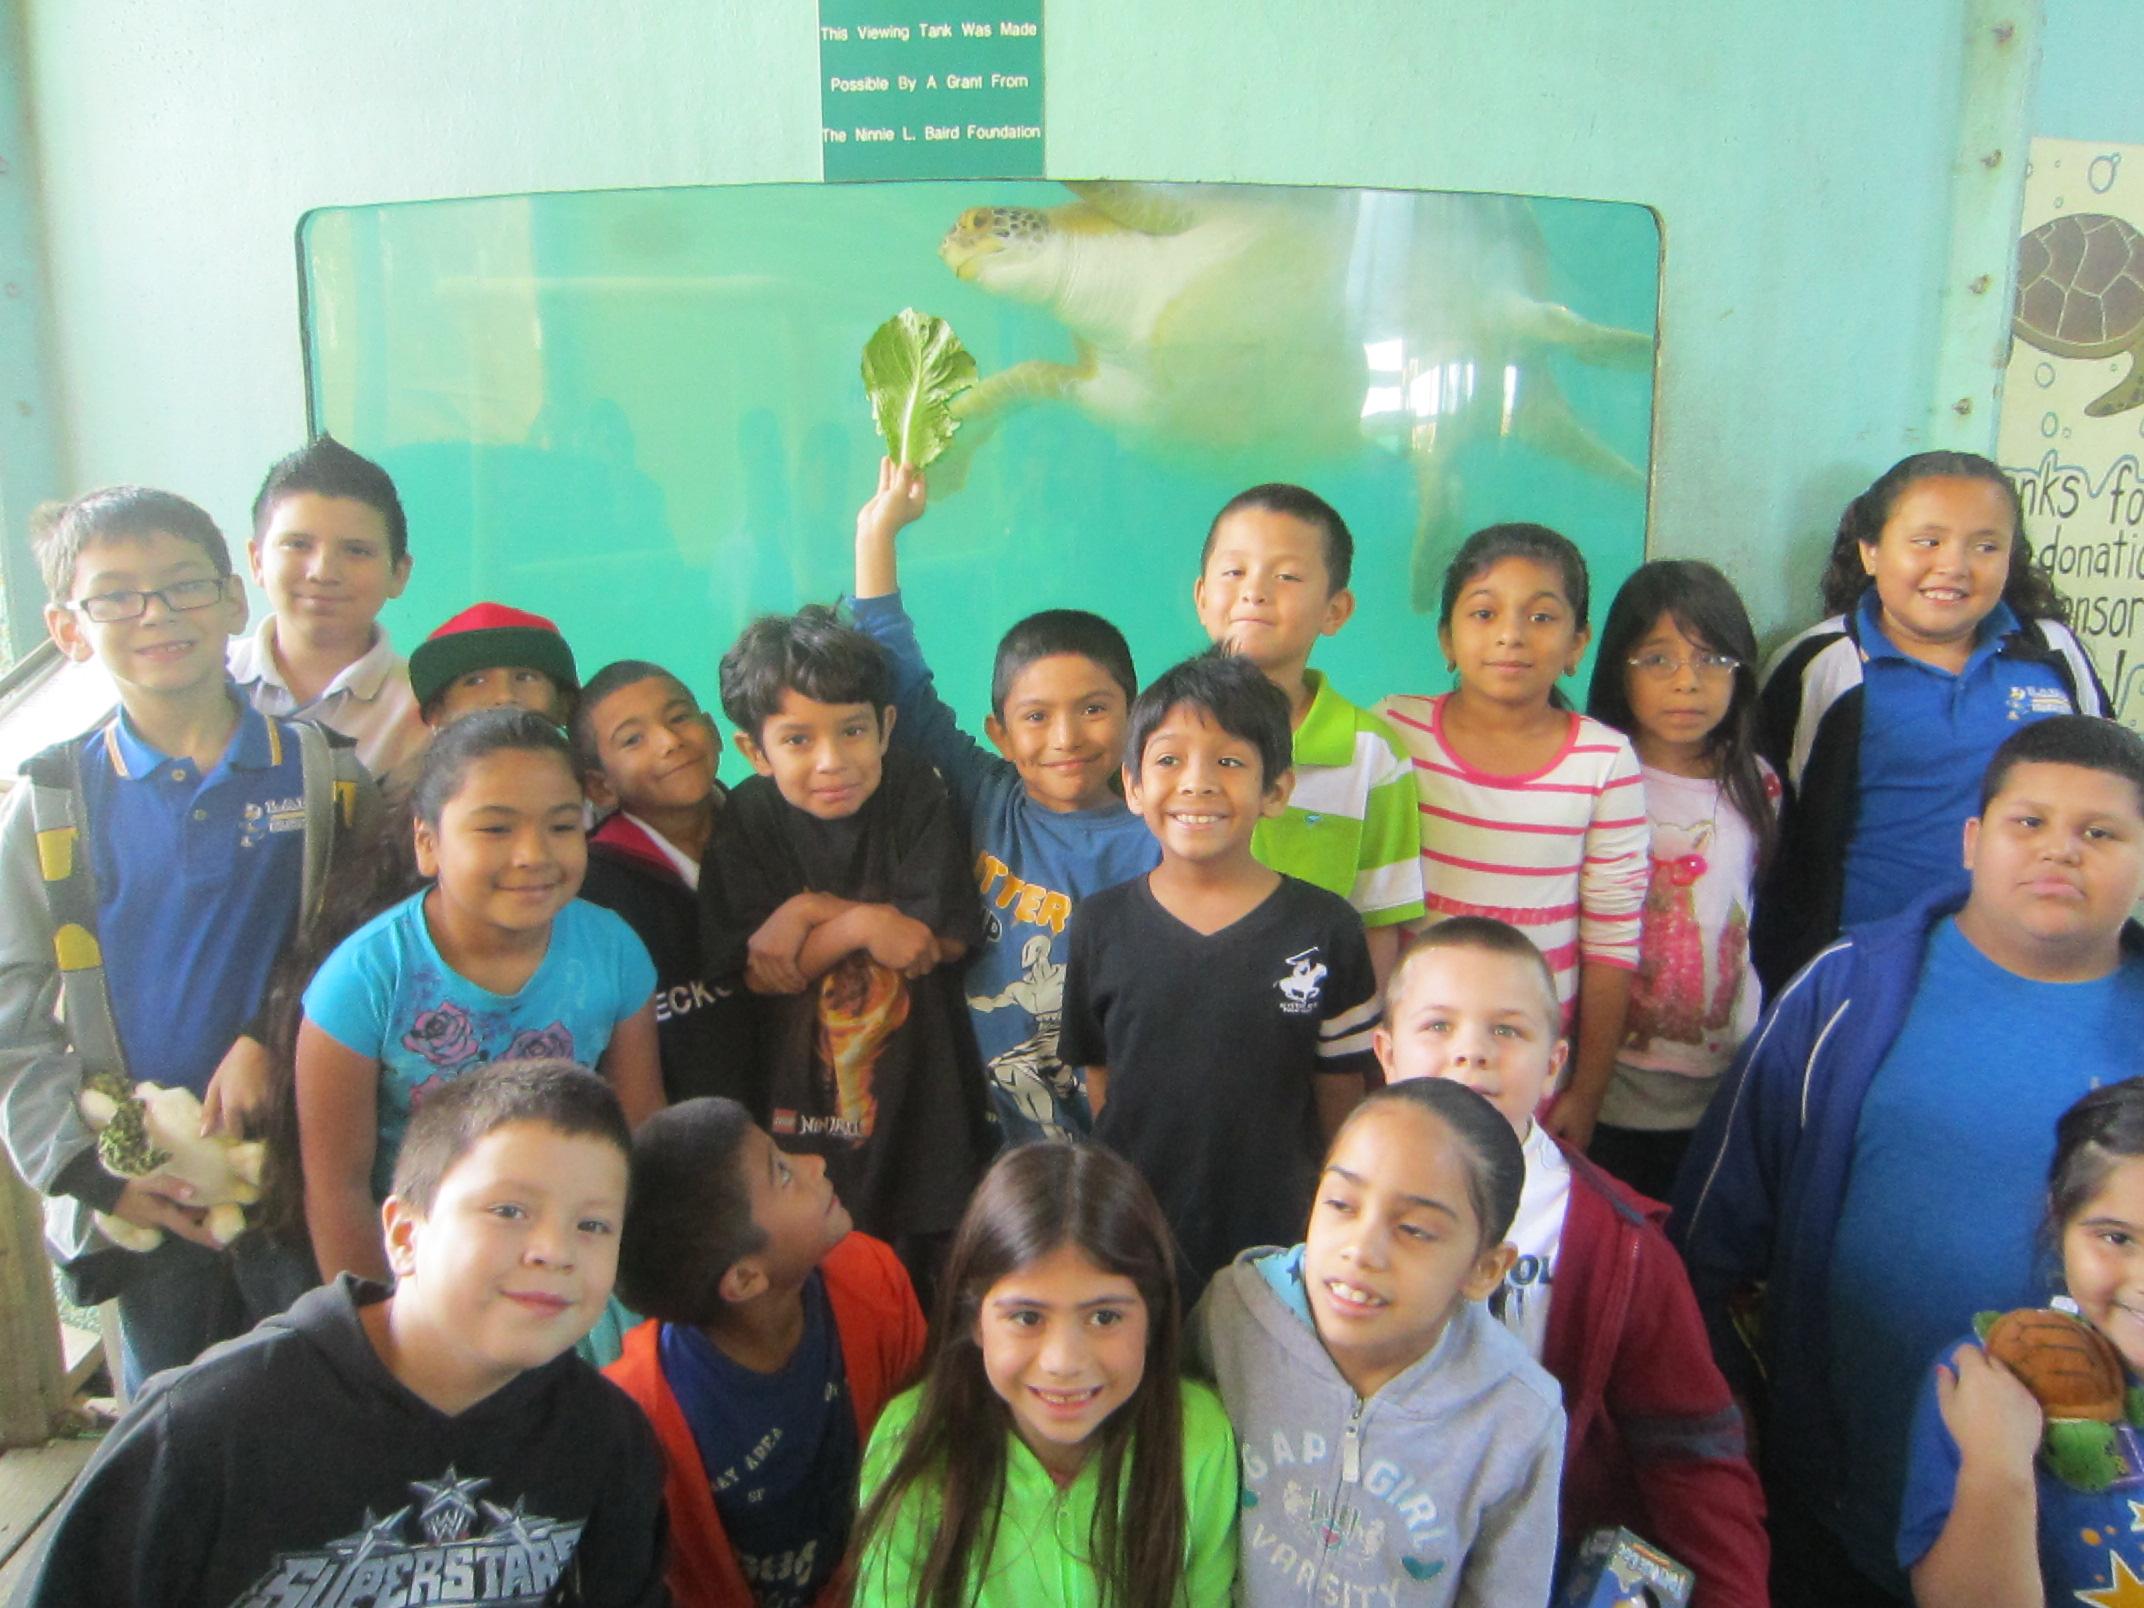 Lamar recycling club raises $1,350 for wildlife